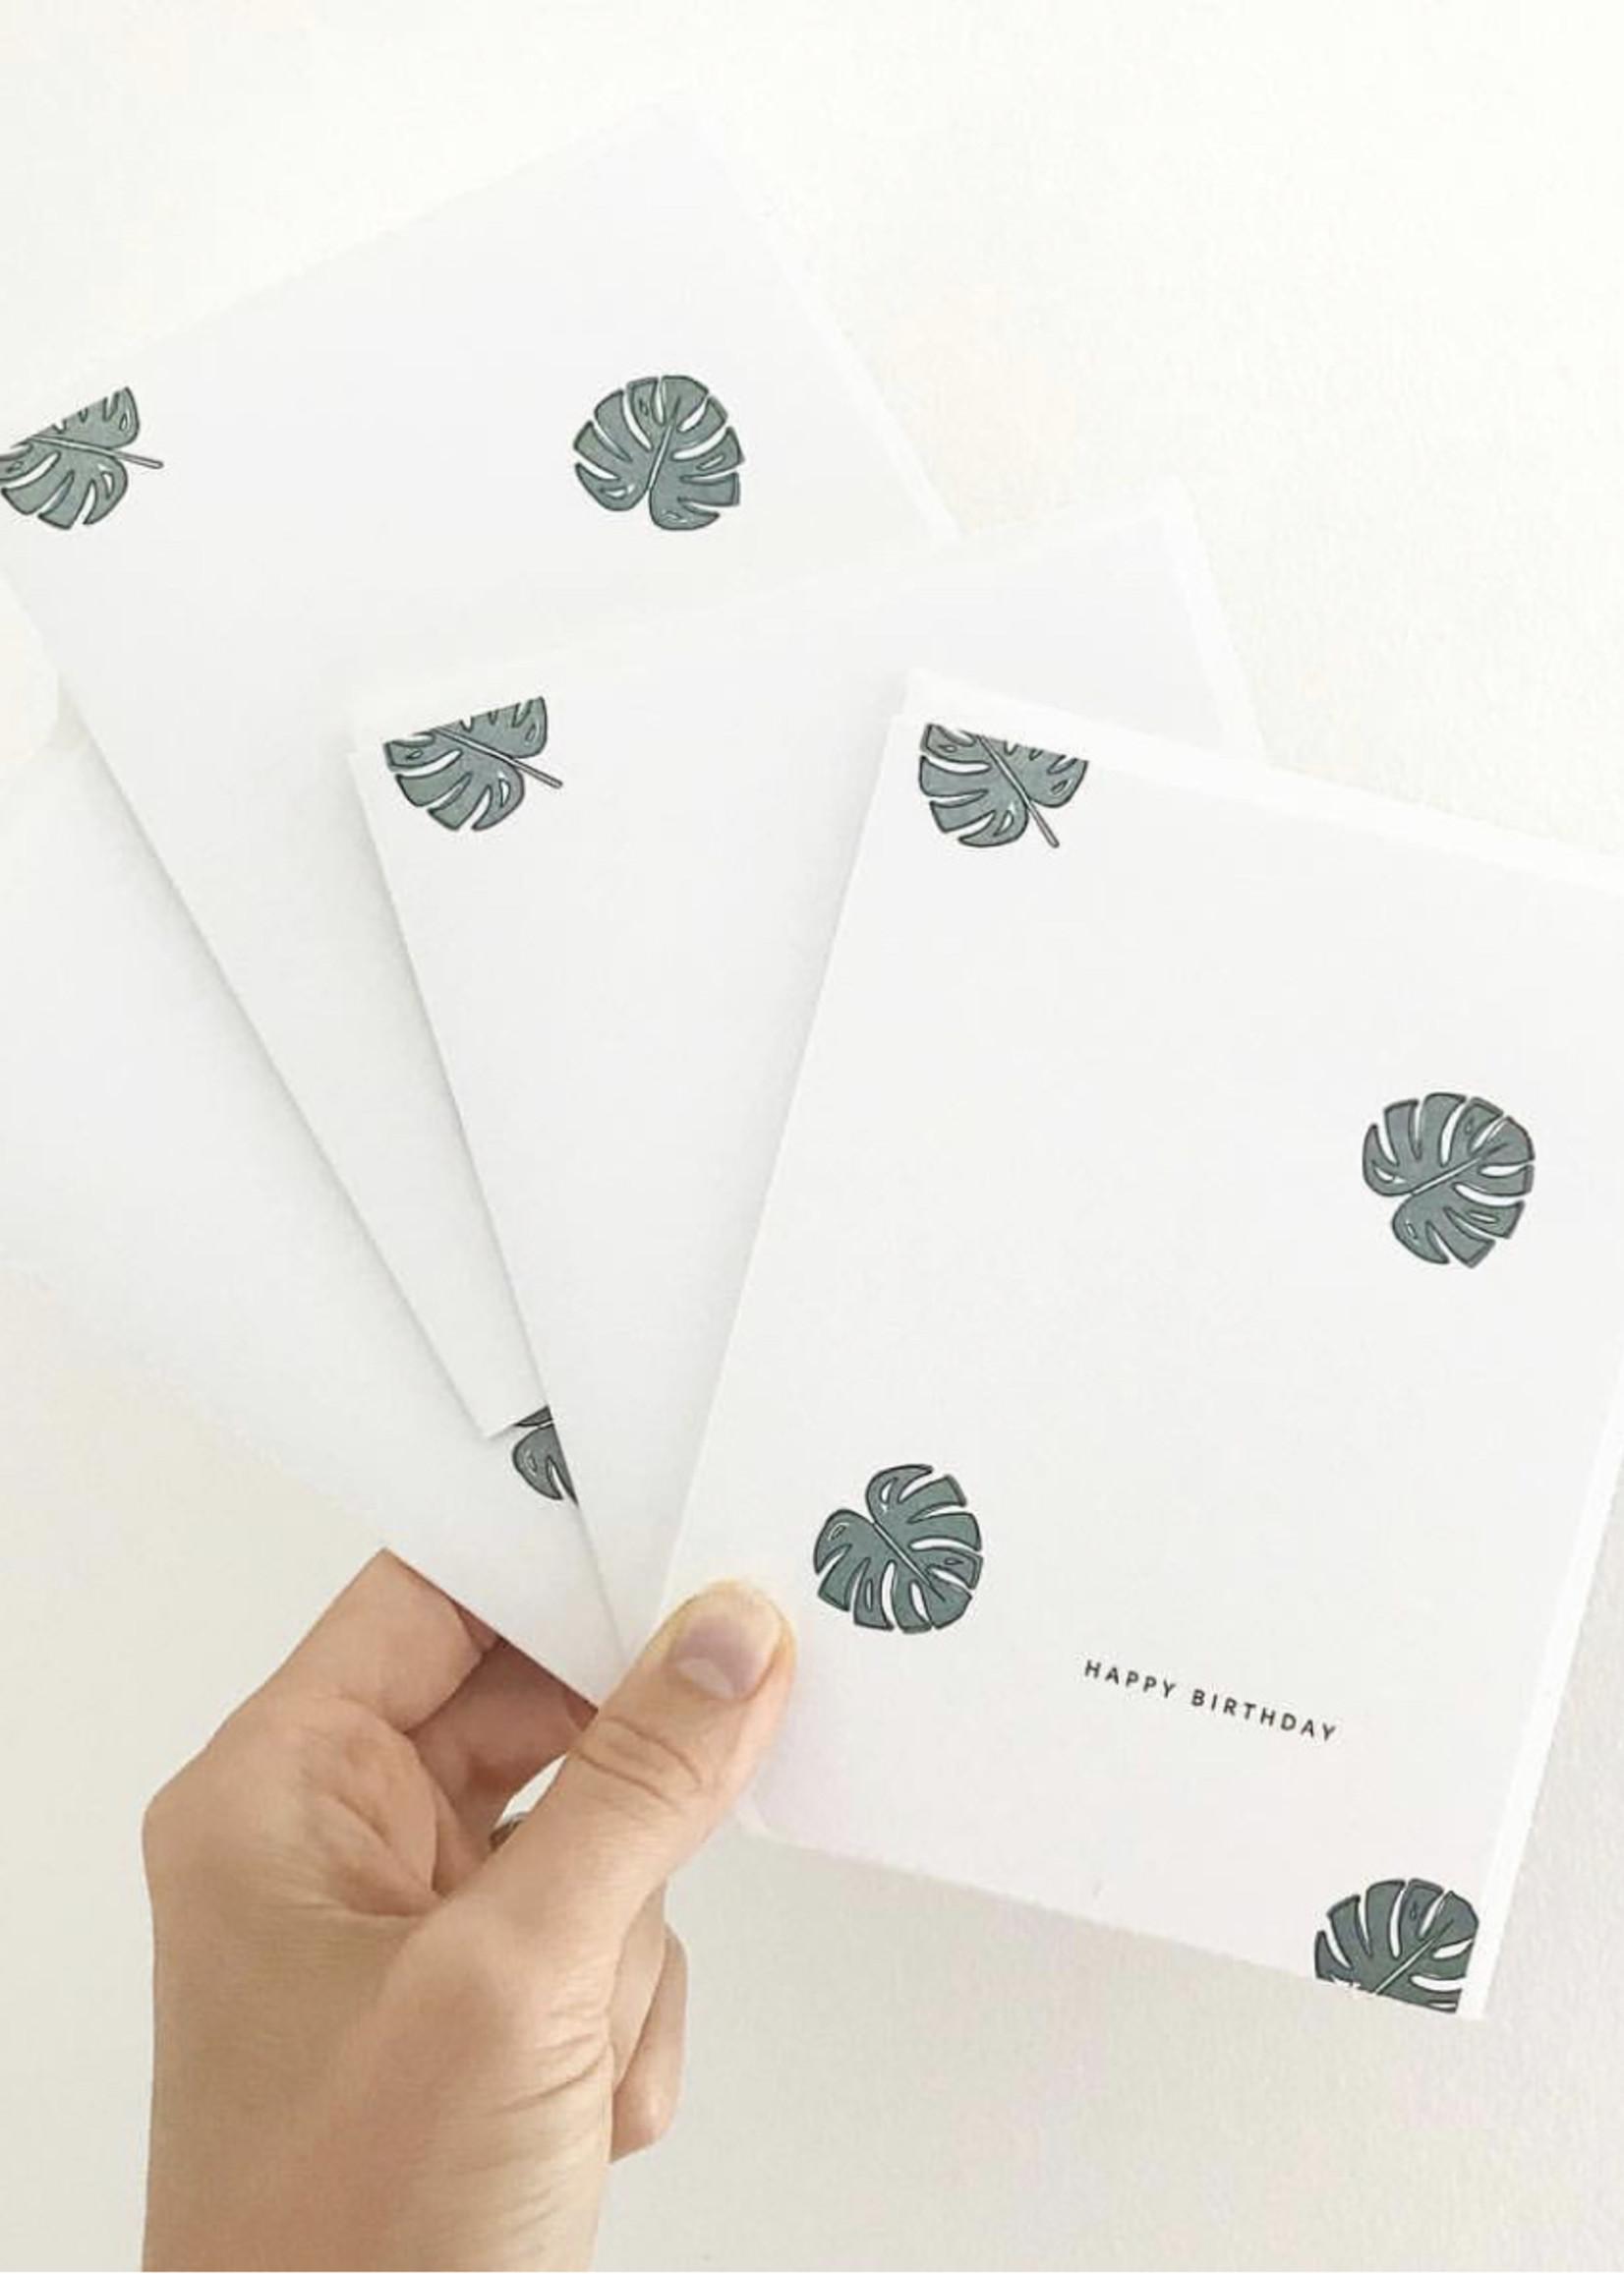 RAMONA + RUTH Philodendron Birthday Greeting Card